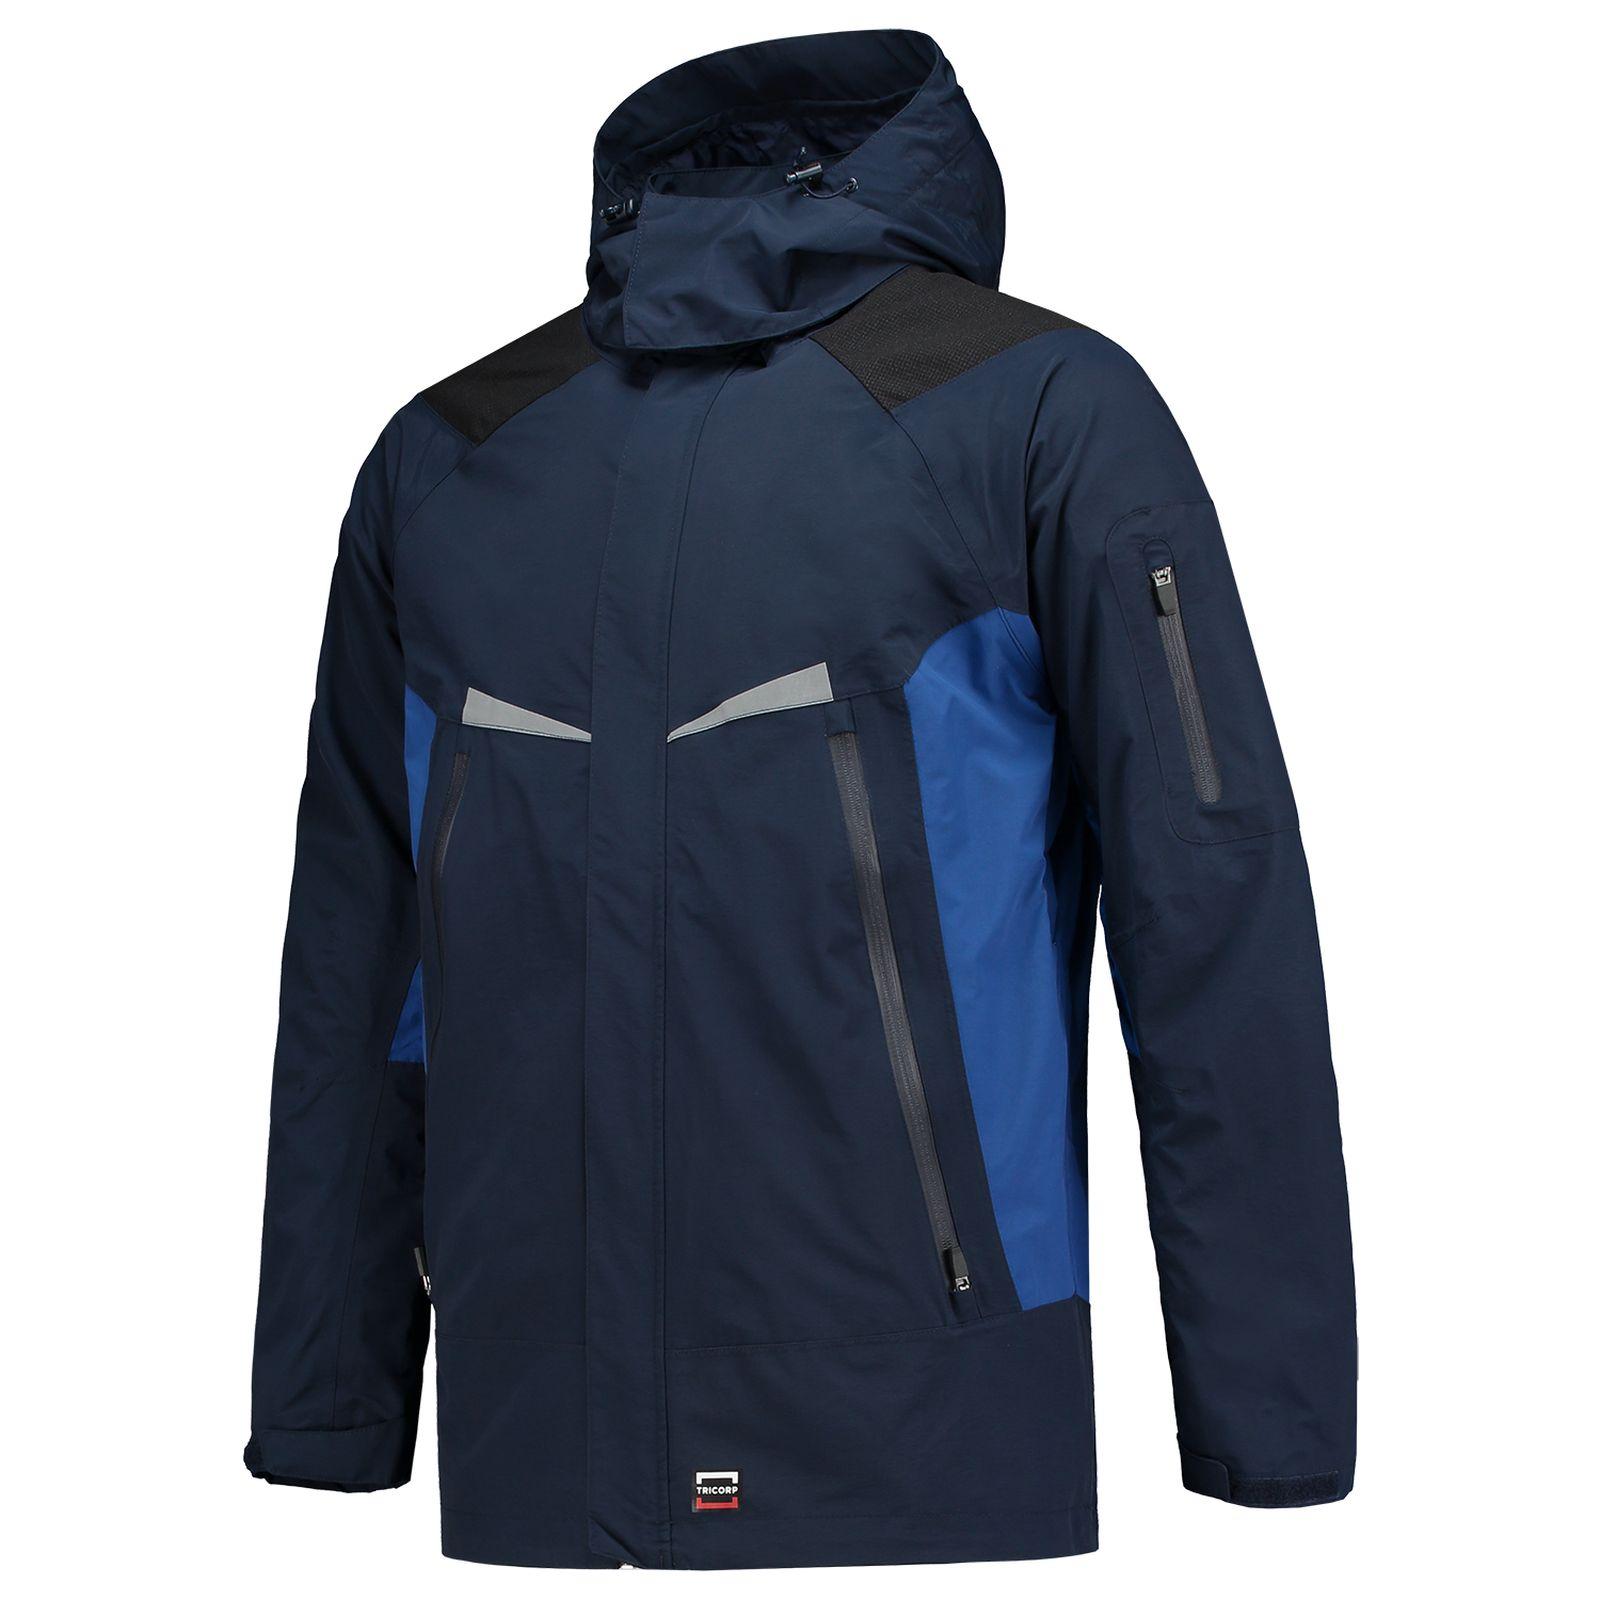 Tricorp Casual Jassen 401002 inktblauw-koningsblauw(InkRoyalbl)